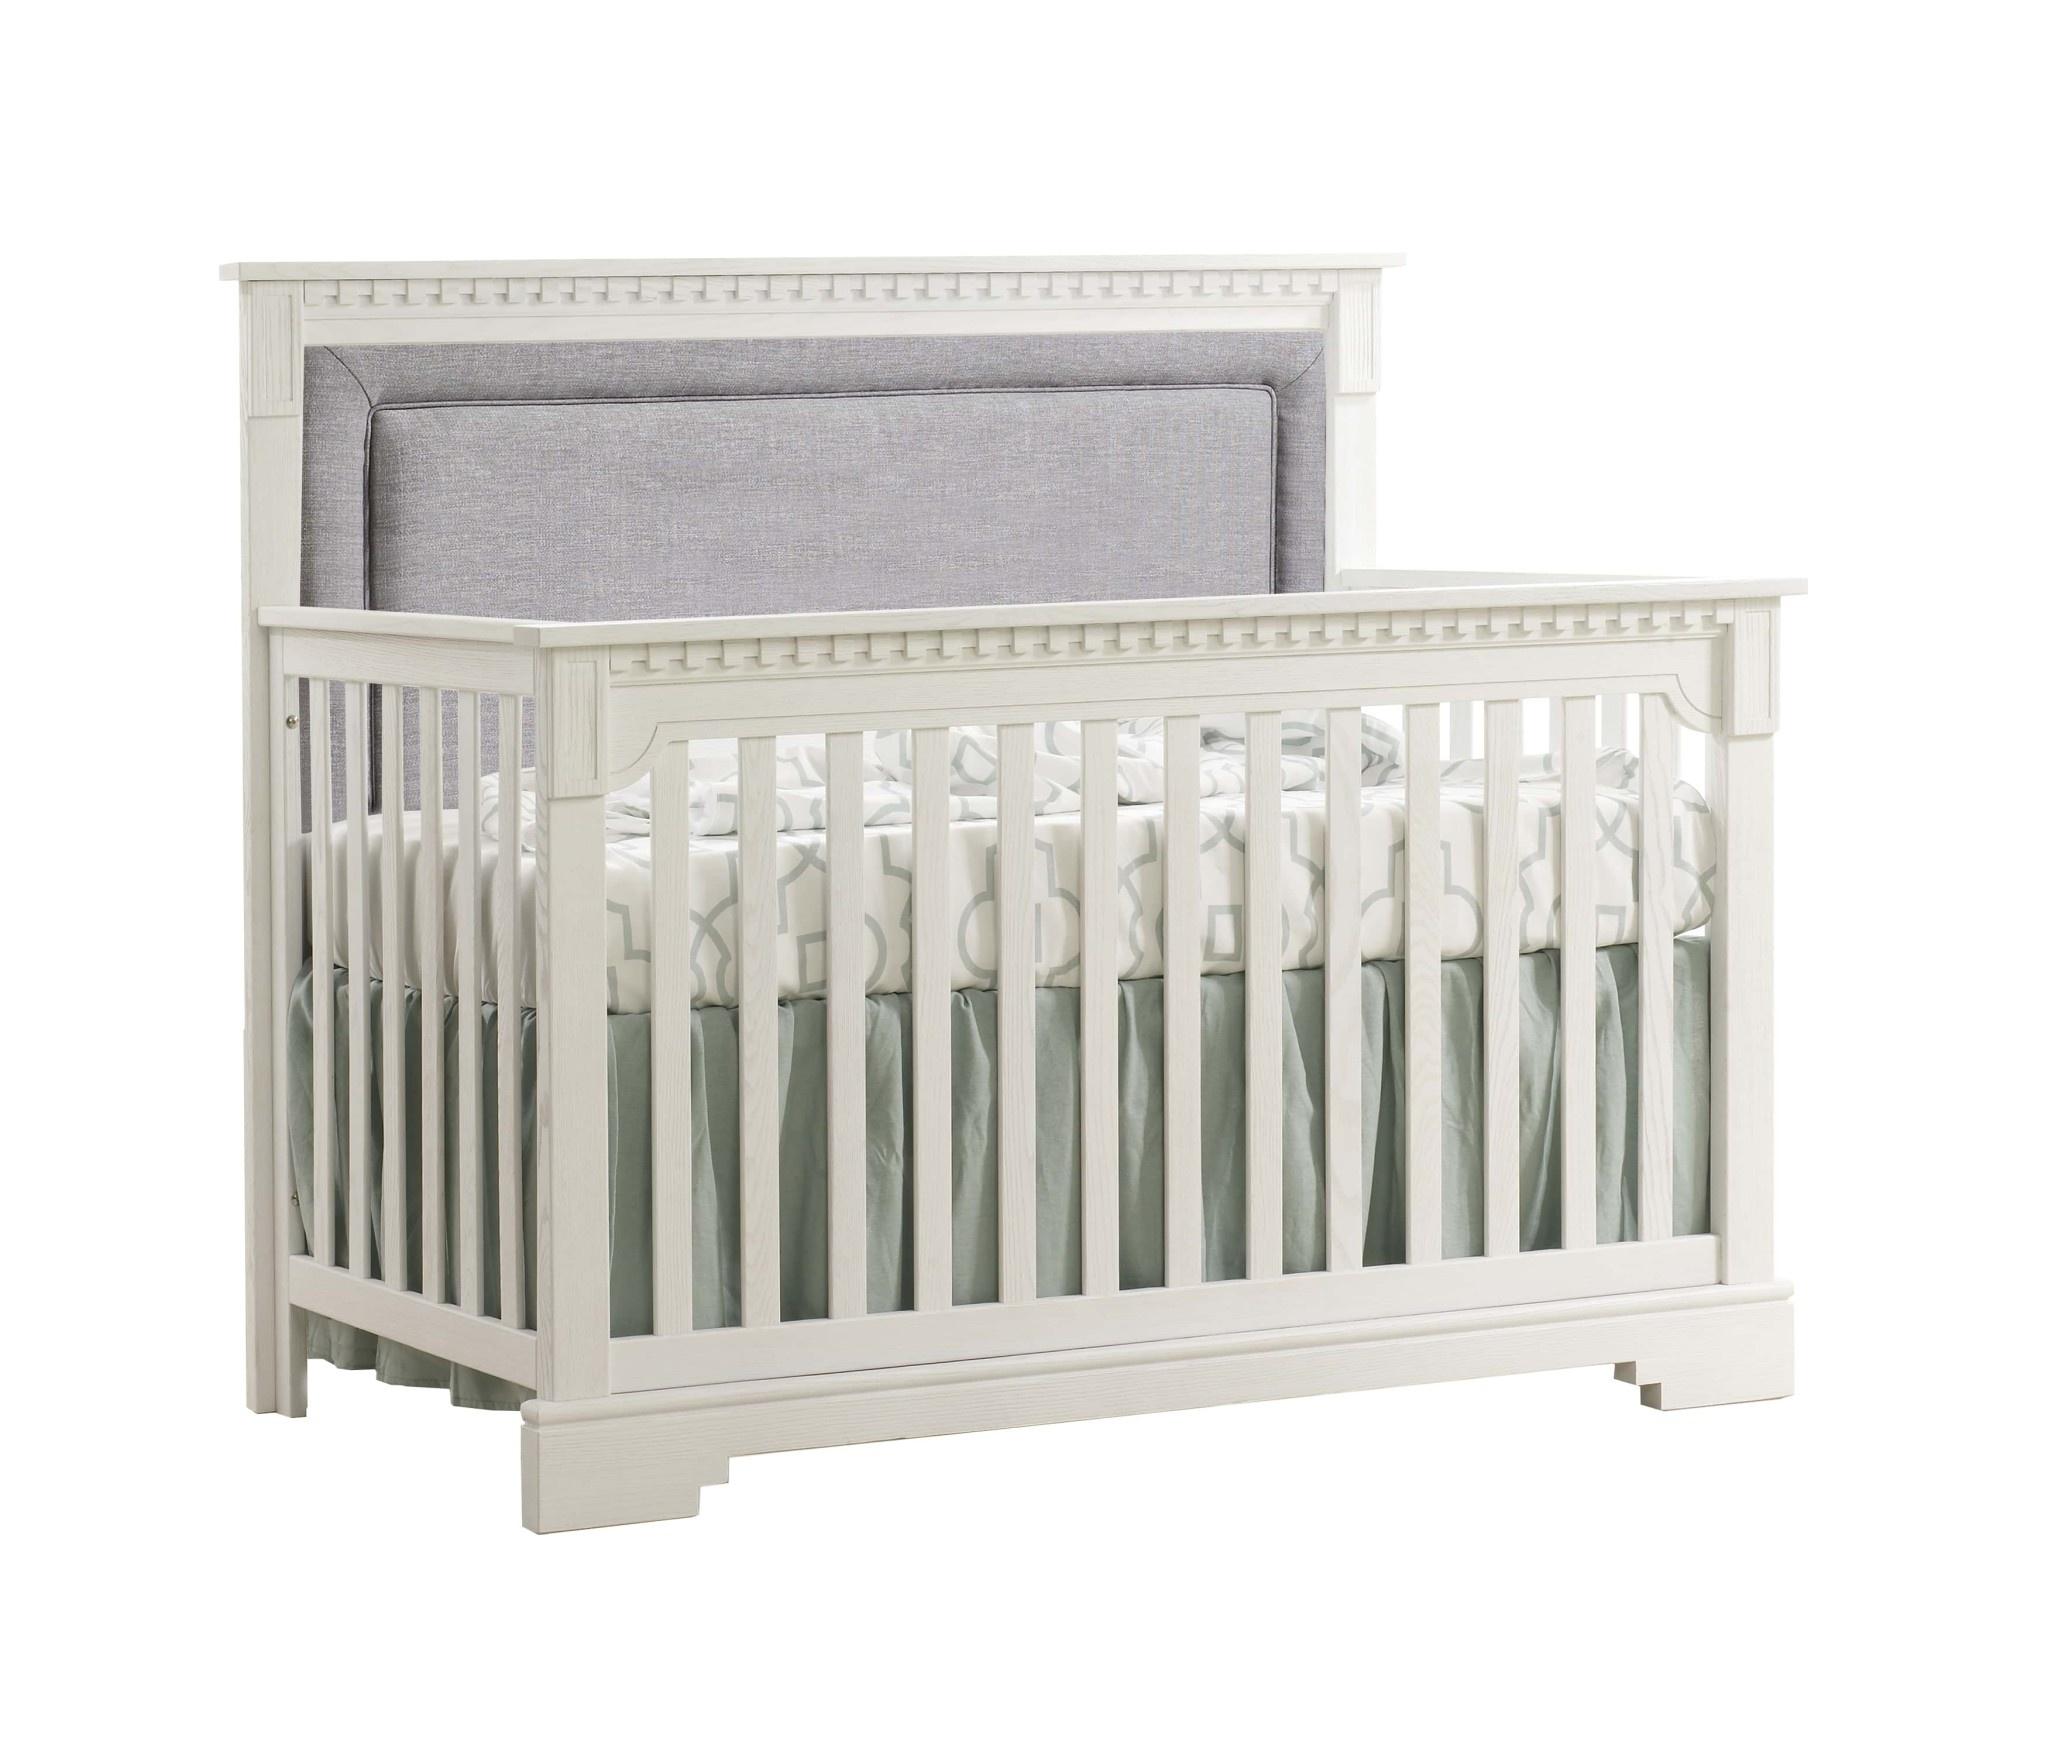 Natart Juvenile Ithaca Convertible Crib w/ Upholstered Panel